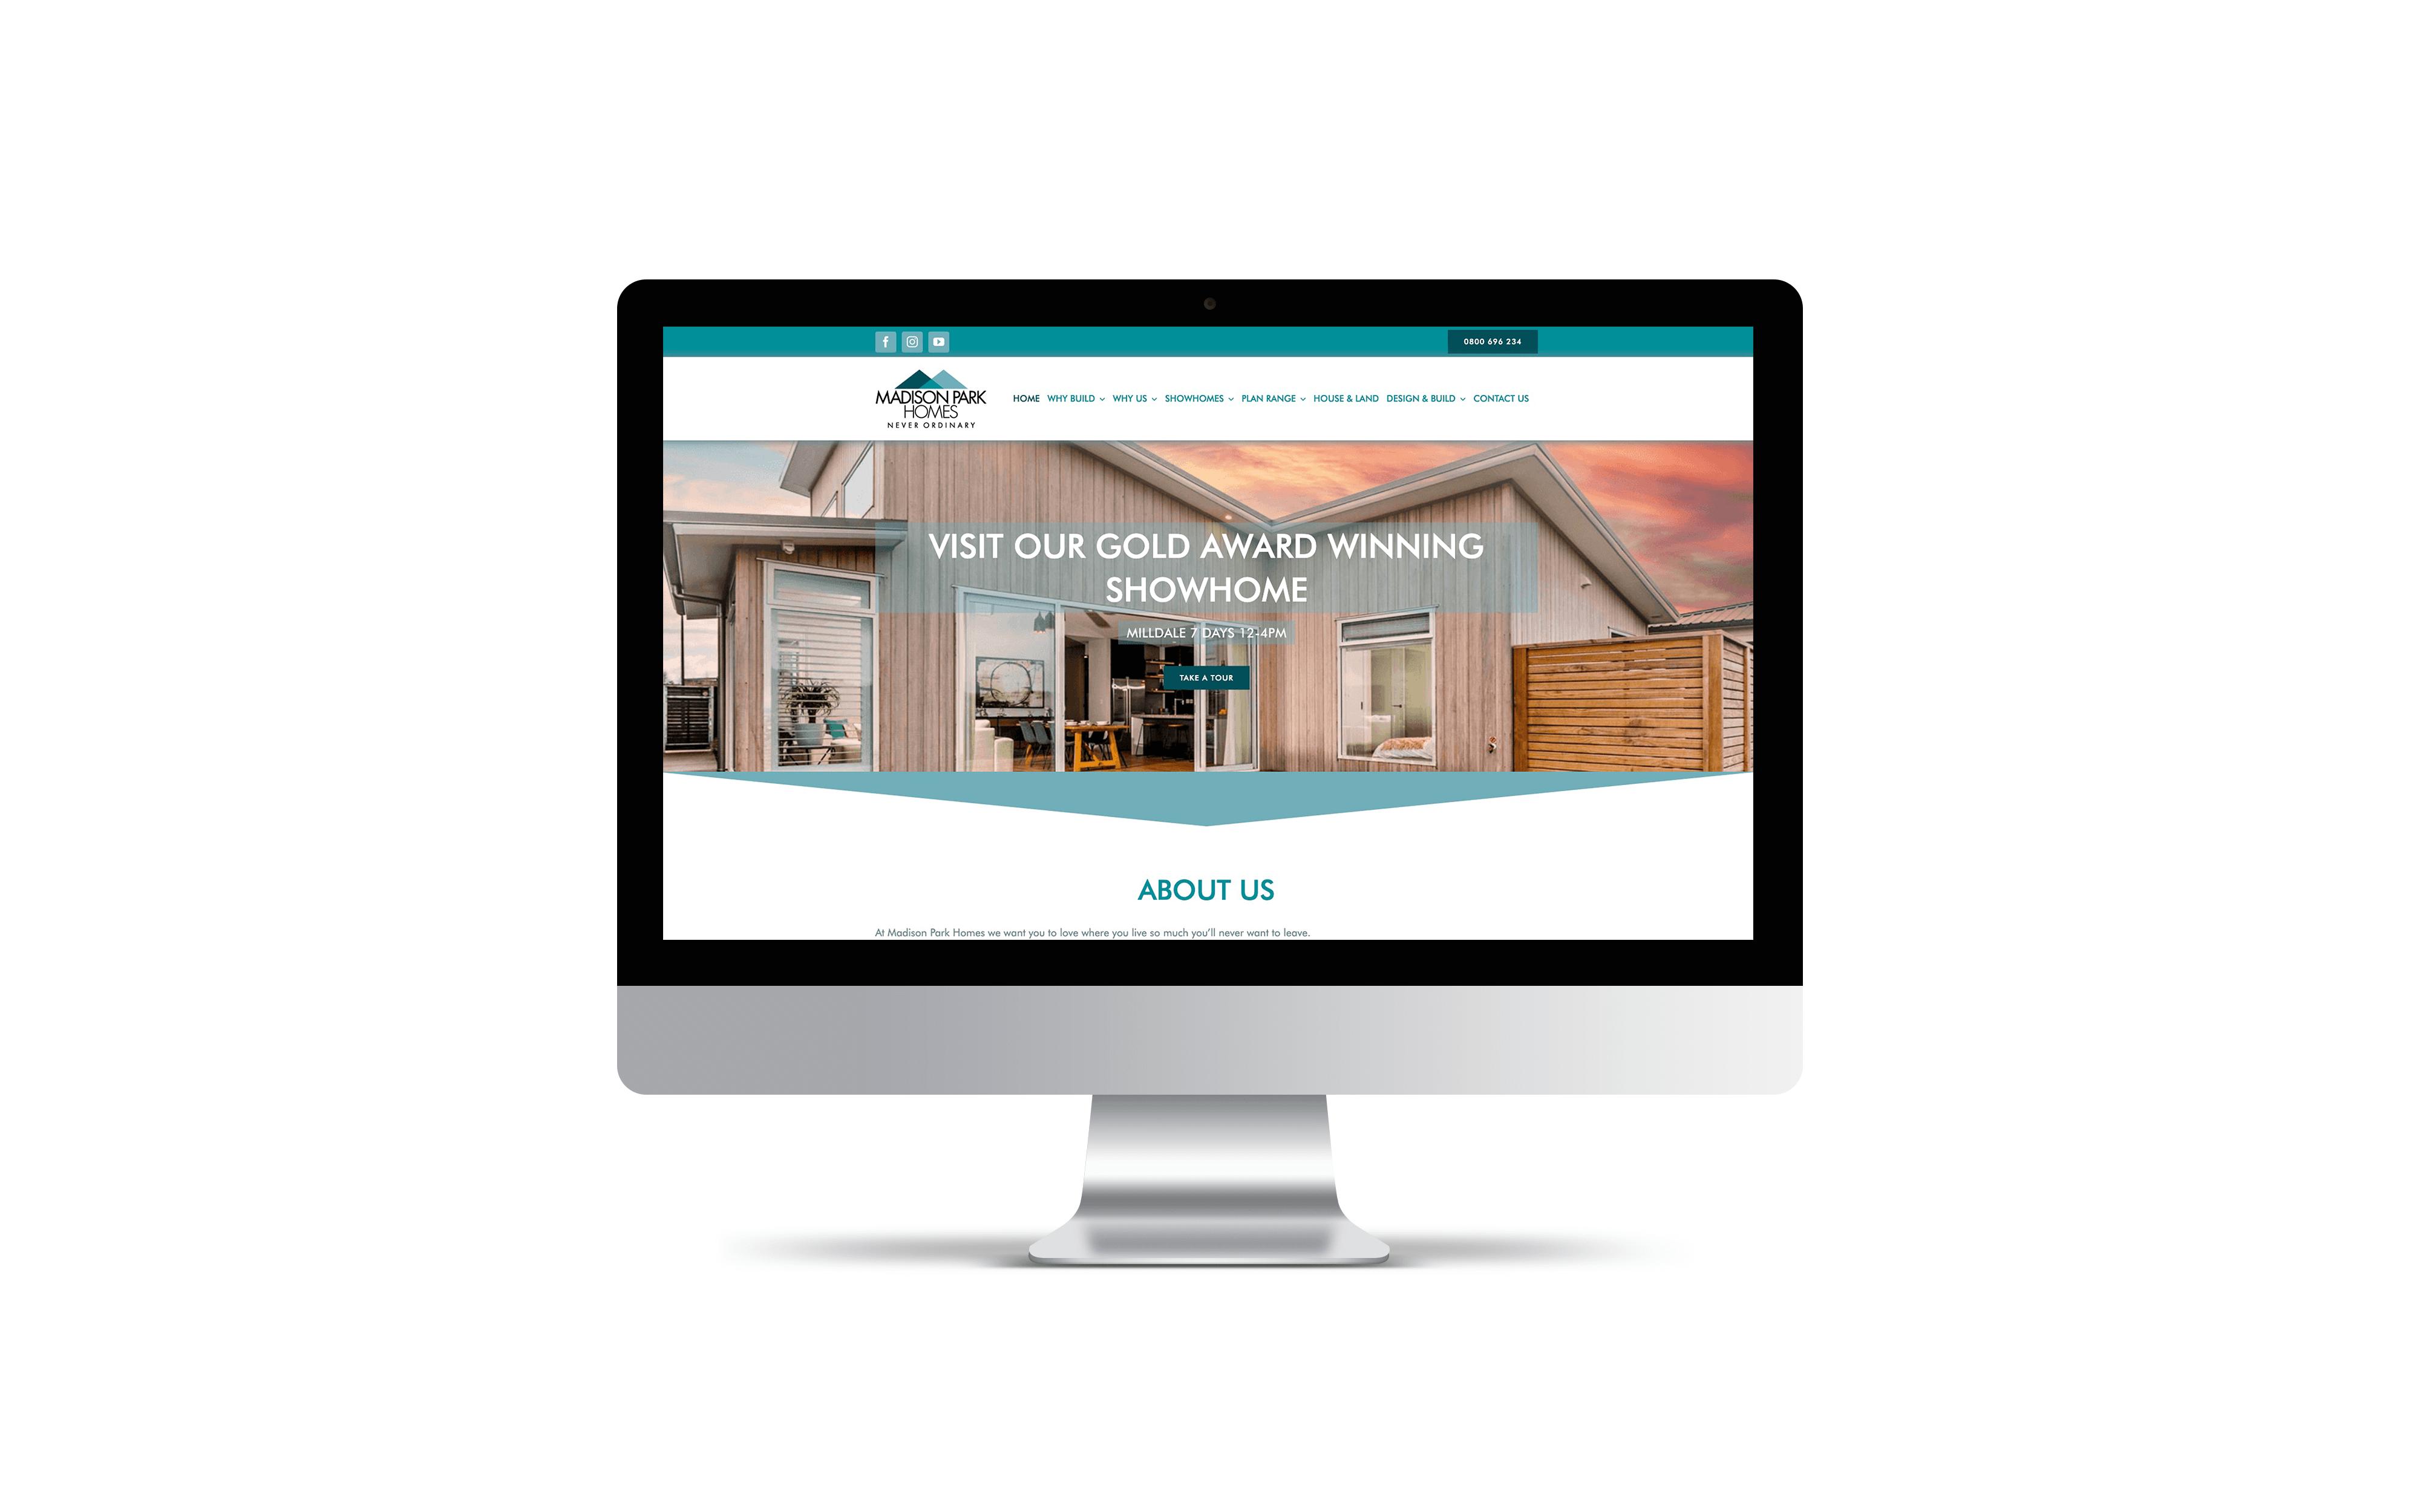 Website: Madison Park Homes